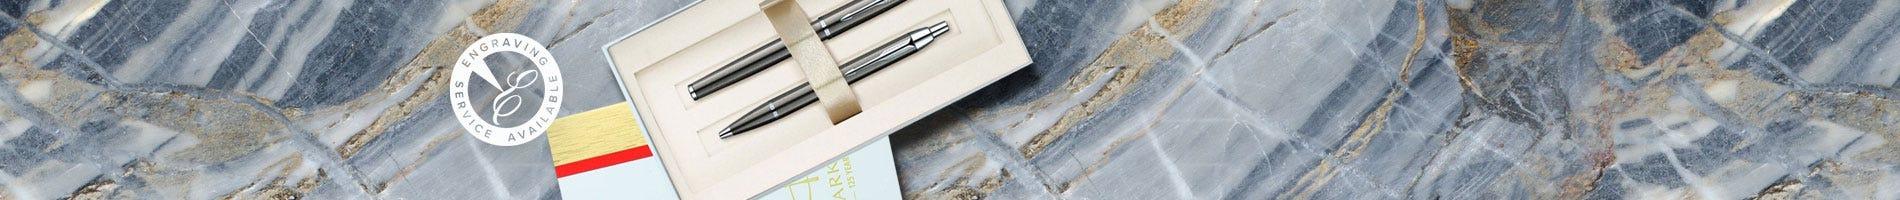 pen set in gift box